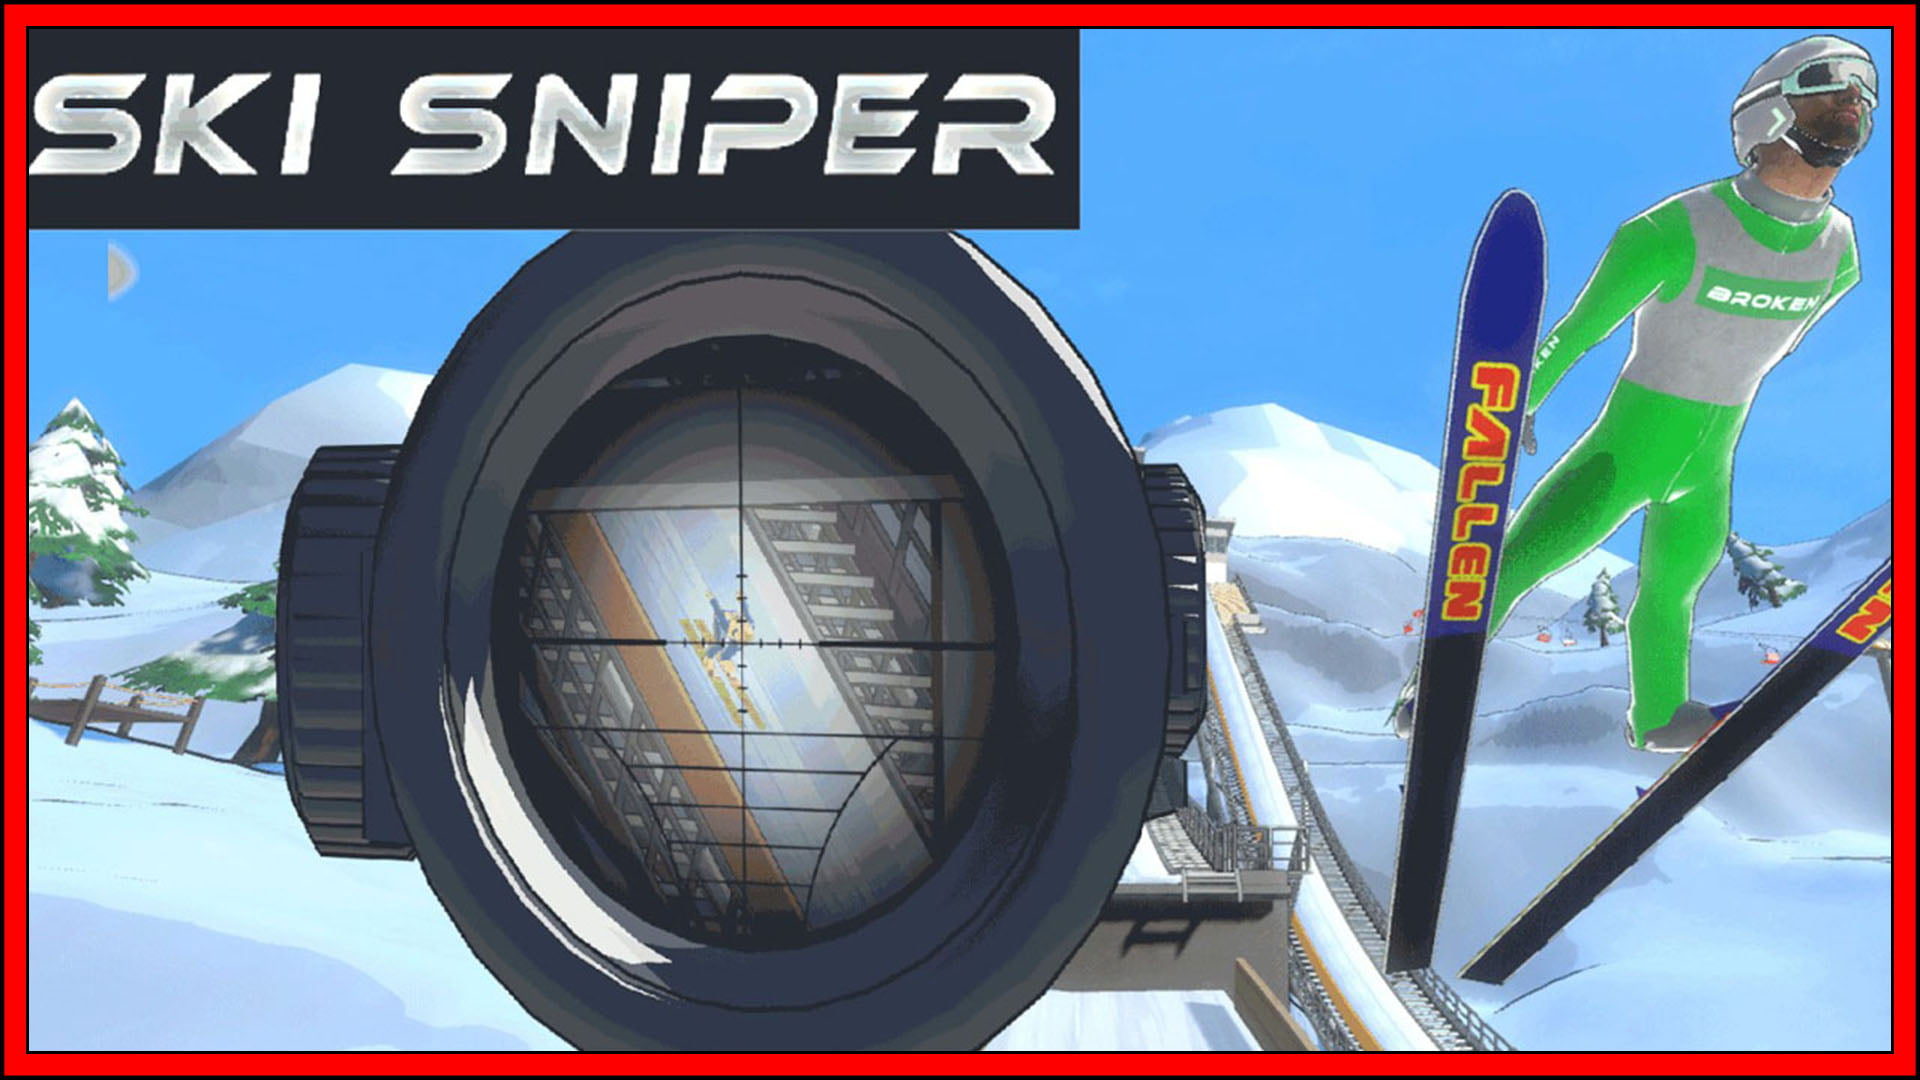 Ski Sniper Fi3